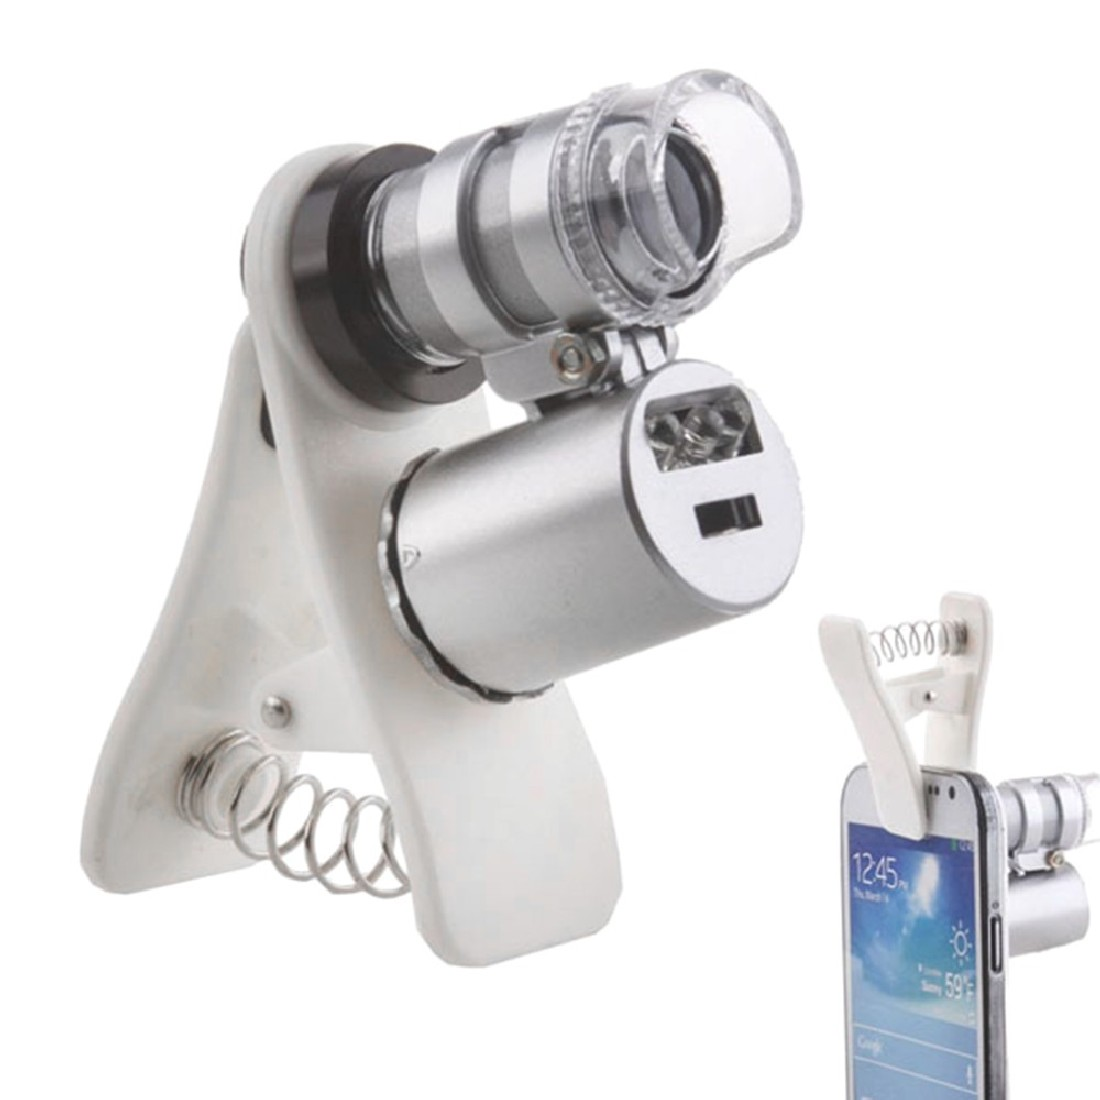 60X Microscope Jeweler Loupe Illuminated Magnifier Glass with LED UV Light New